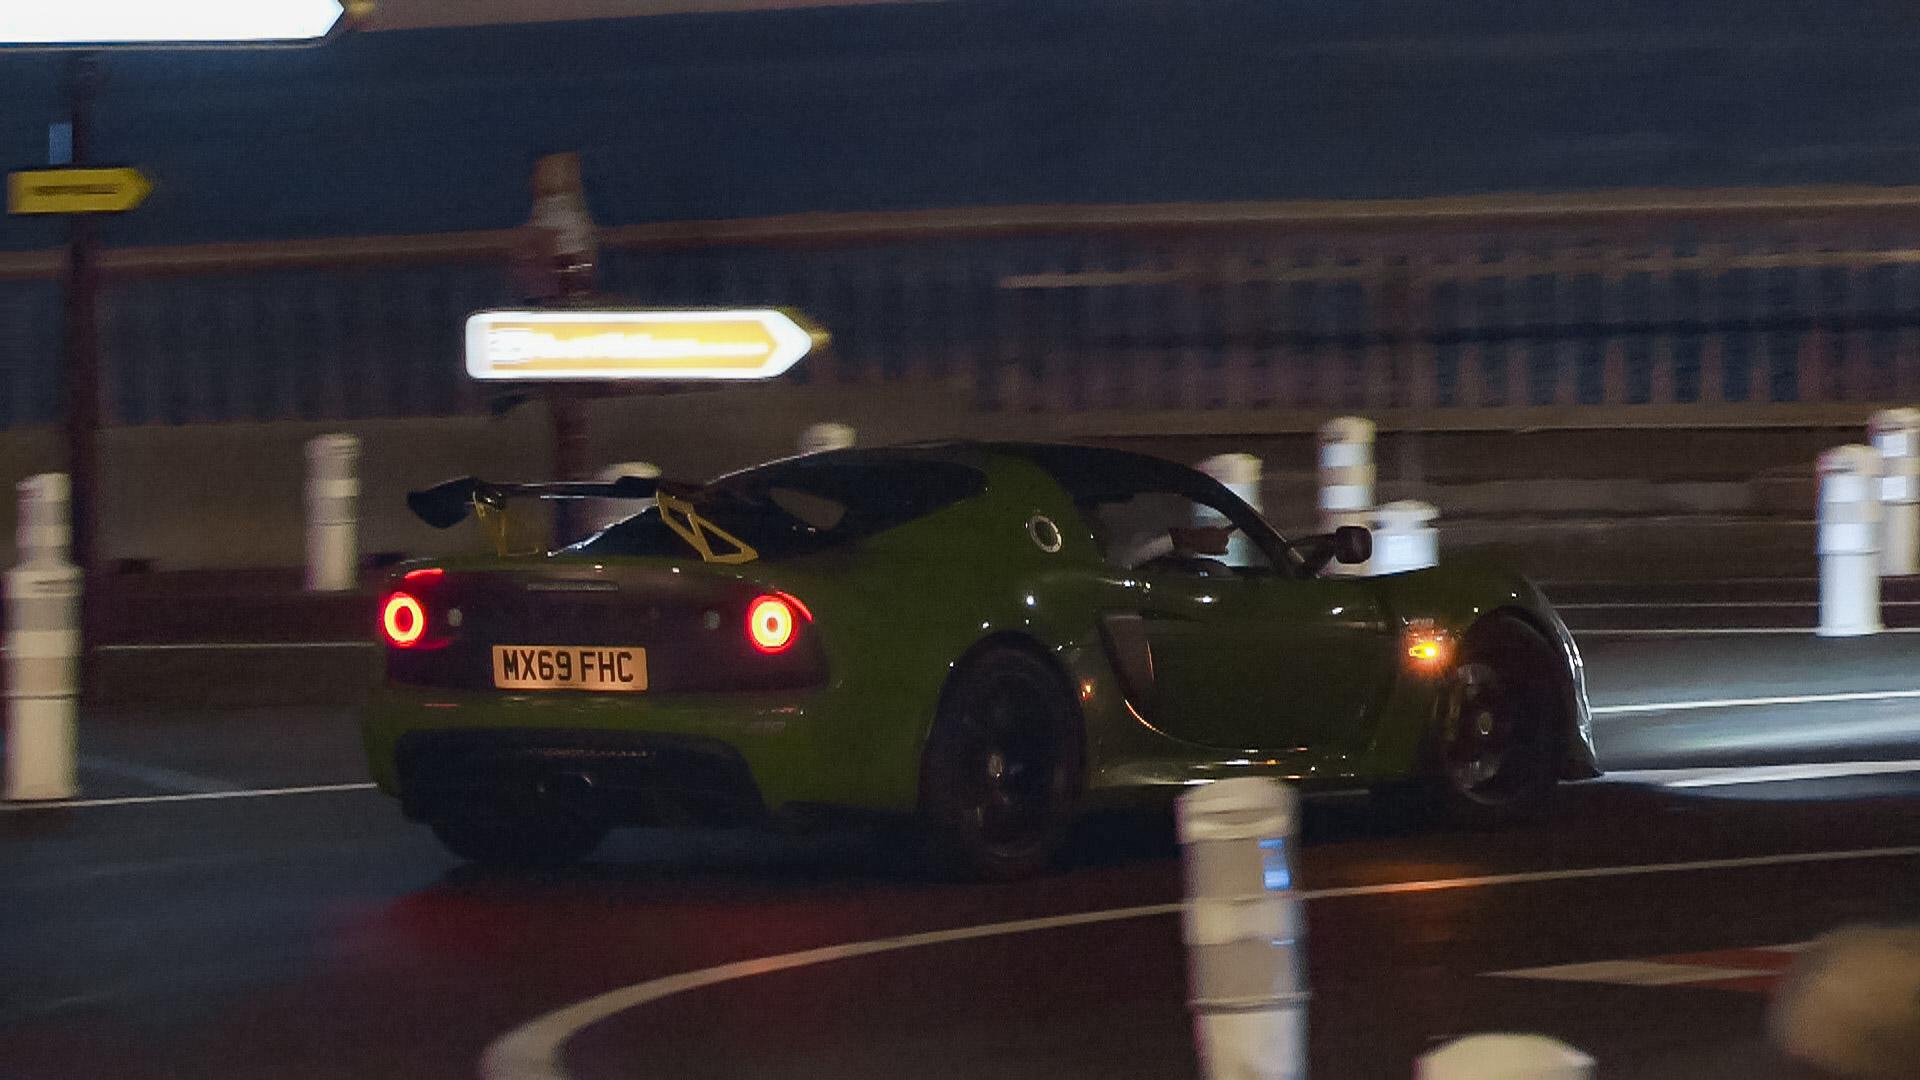 Lotus Exige 410 - MX69-FHC (GB)